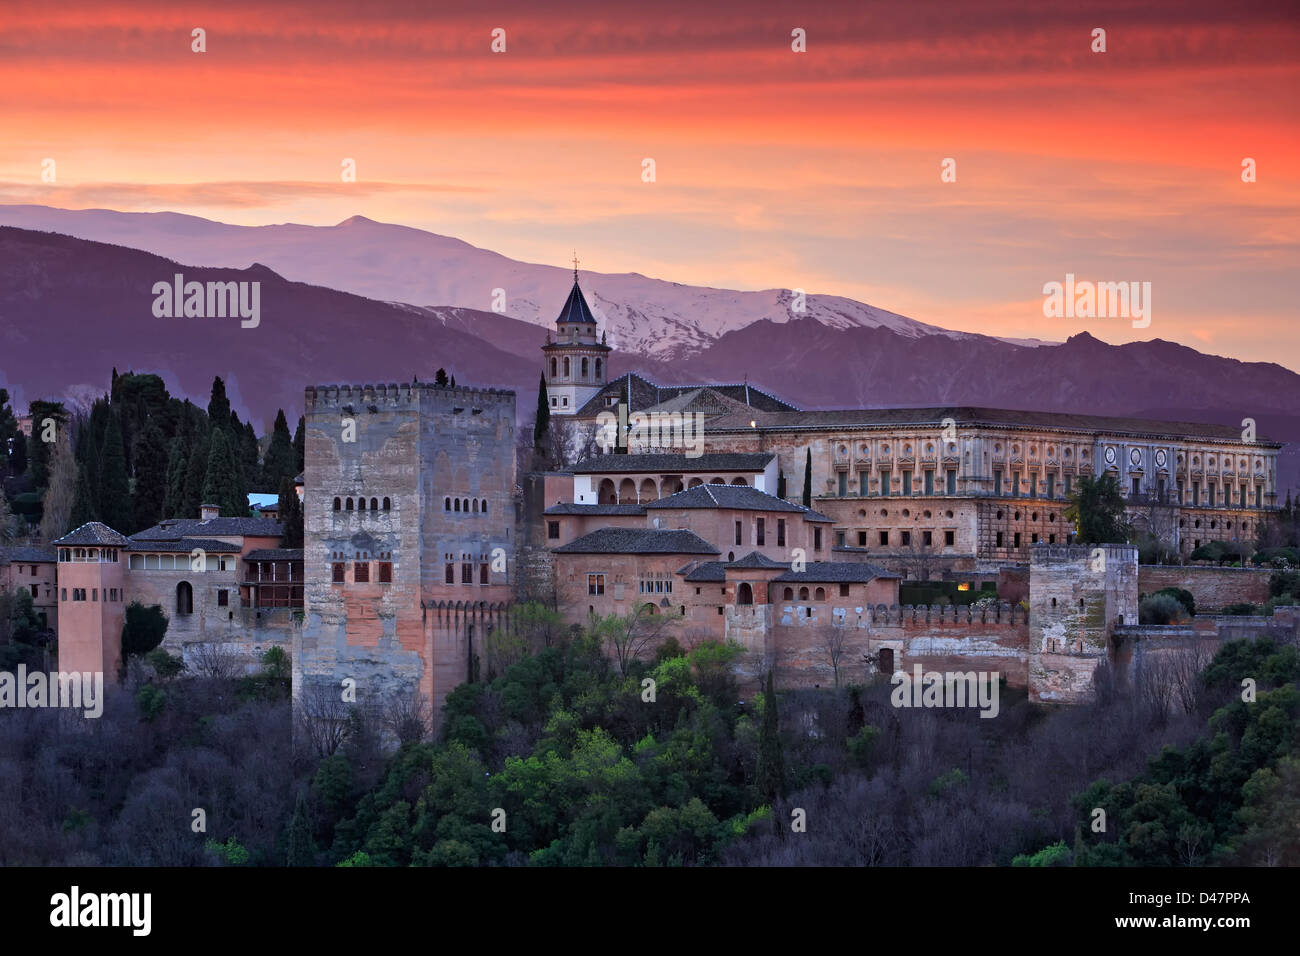 The Alhambra and snow-covered Sierra Nevada (Snowy Range), Granada, Spain - Stock Image